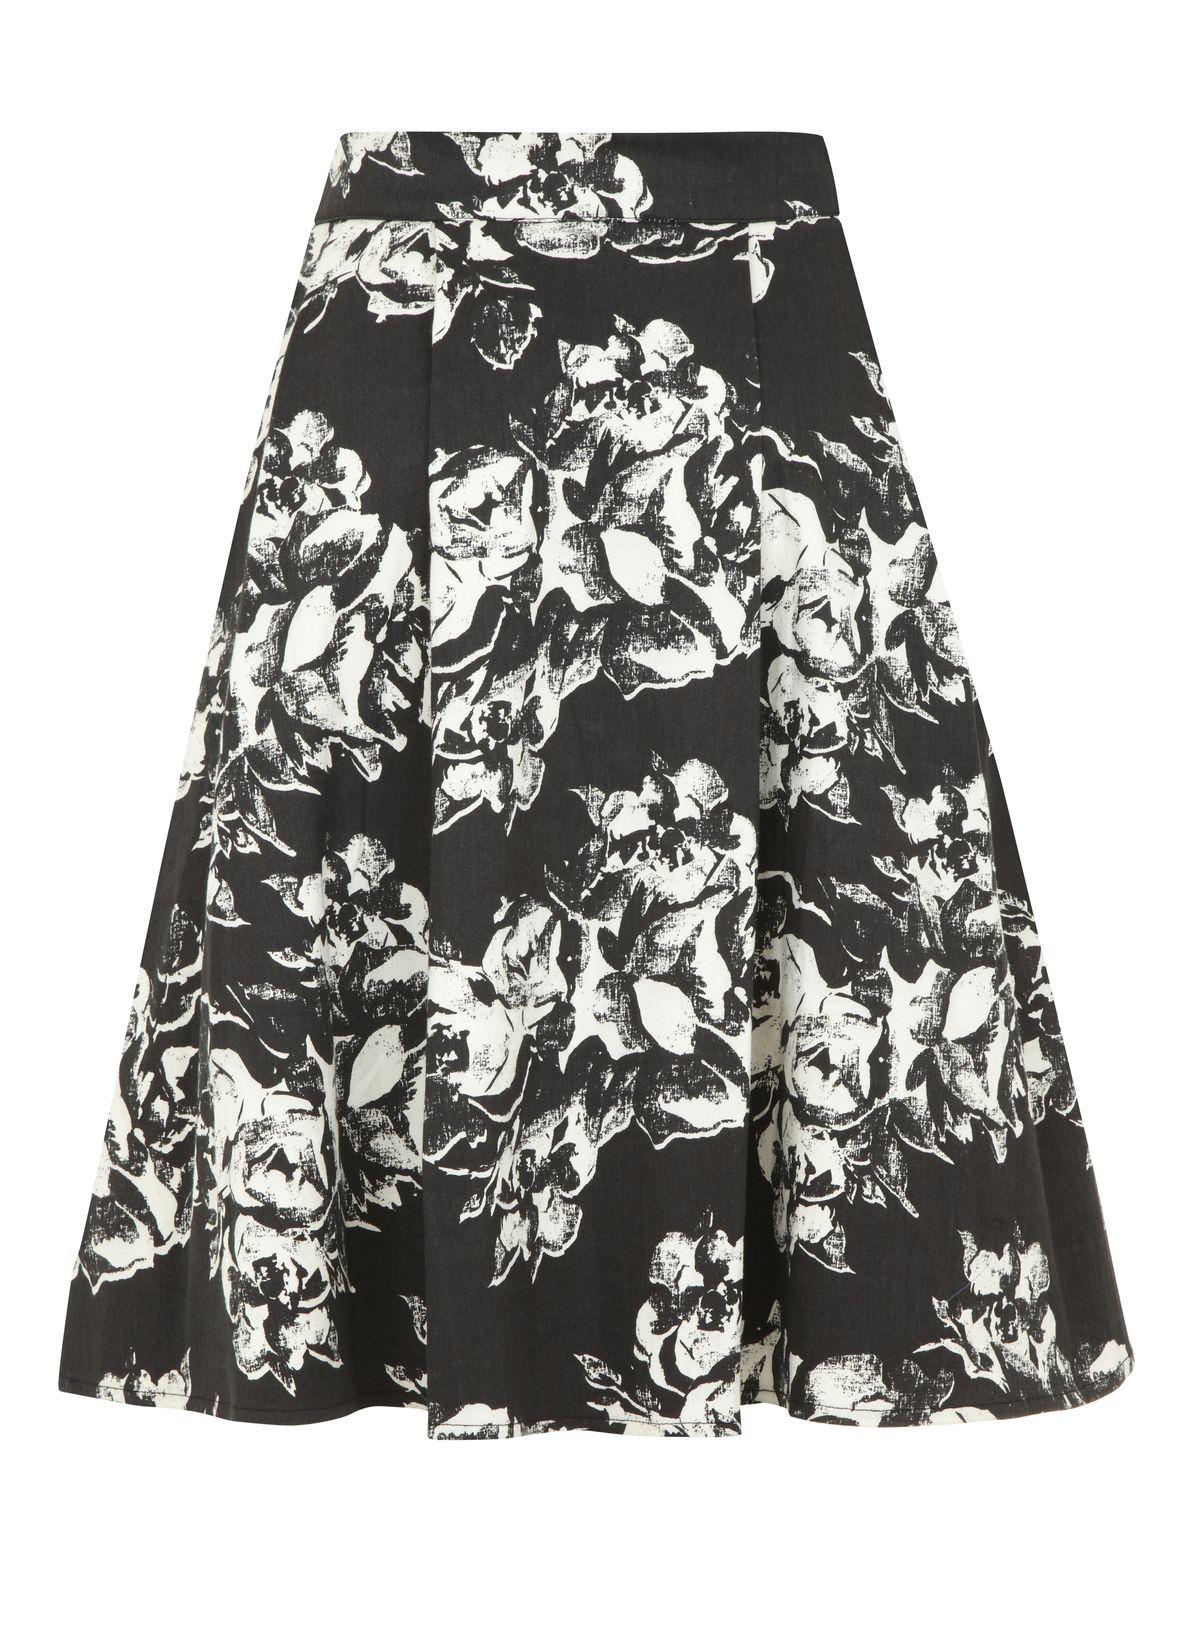 City floral print skirt